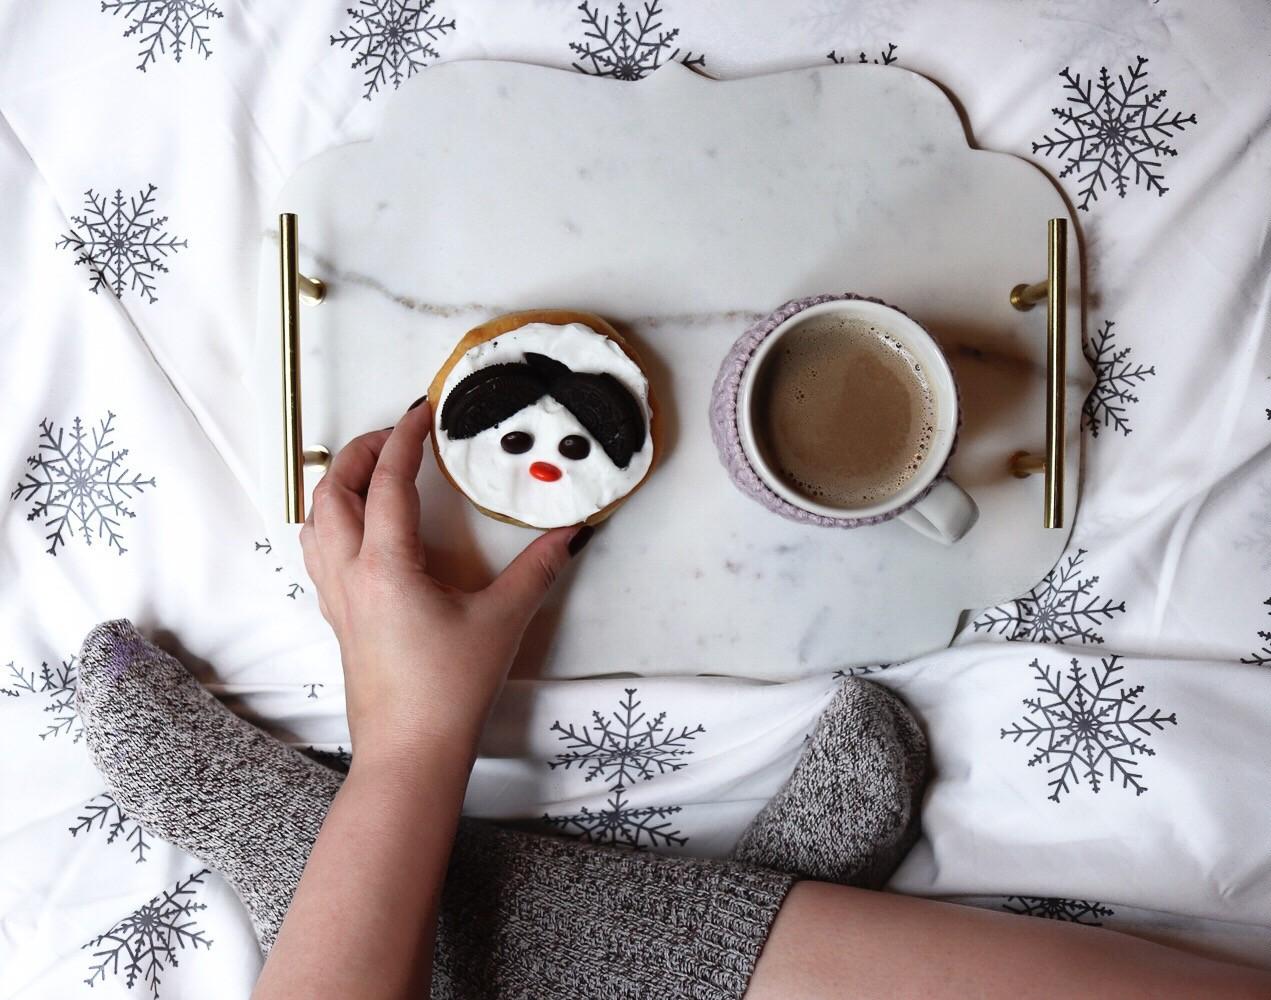 Winter holiday snowflake sheet set by California Design Den on Amazon